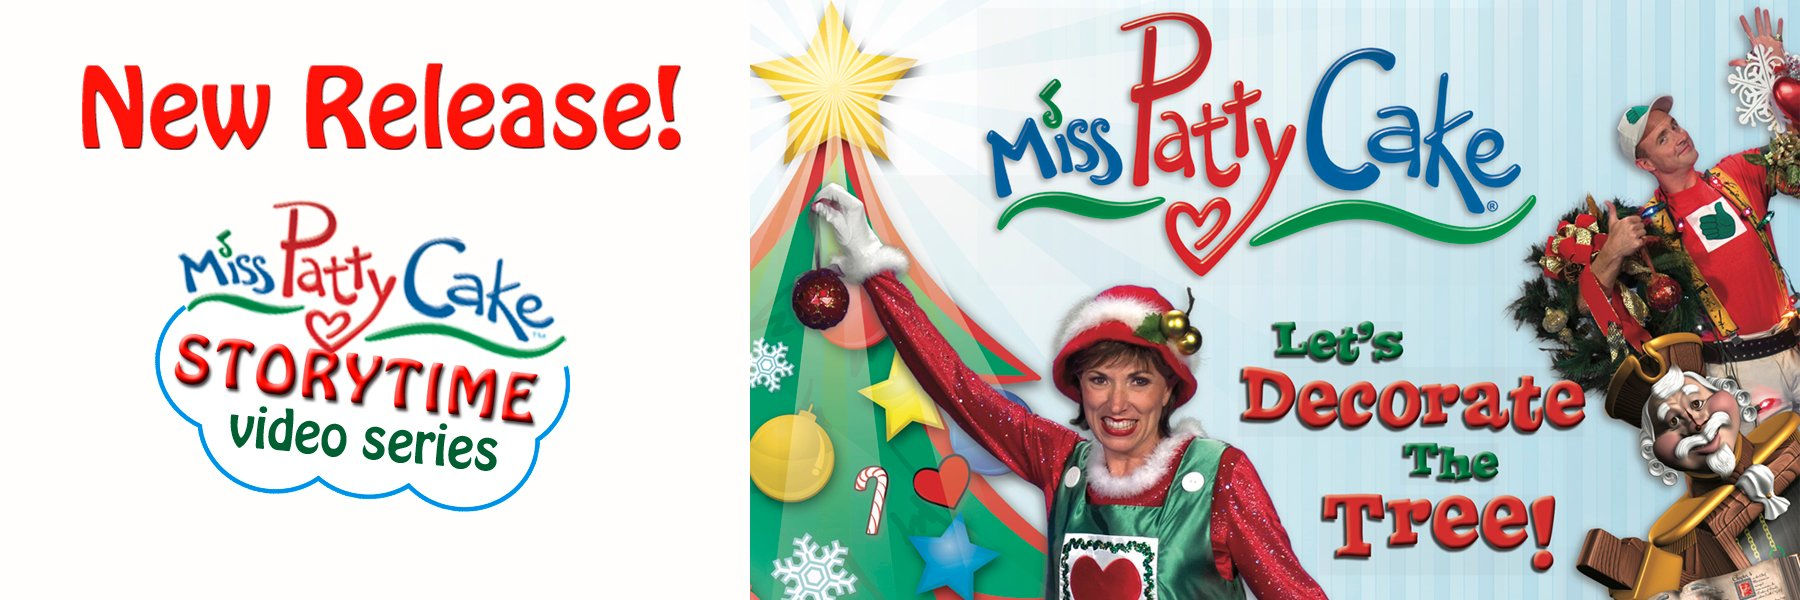 Miss PattyCake Storytime Video Series